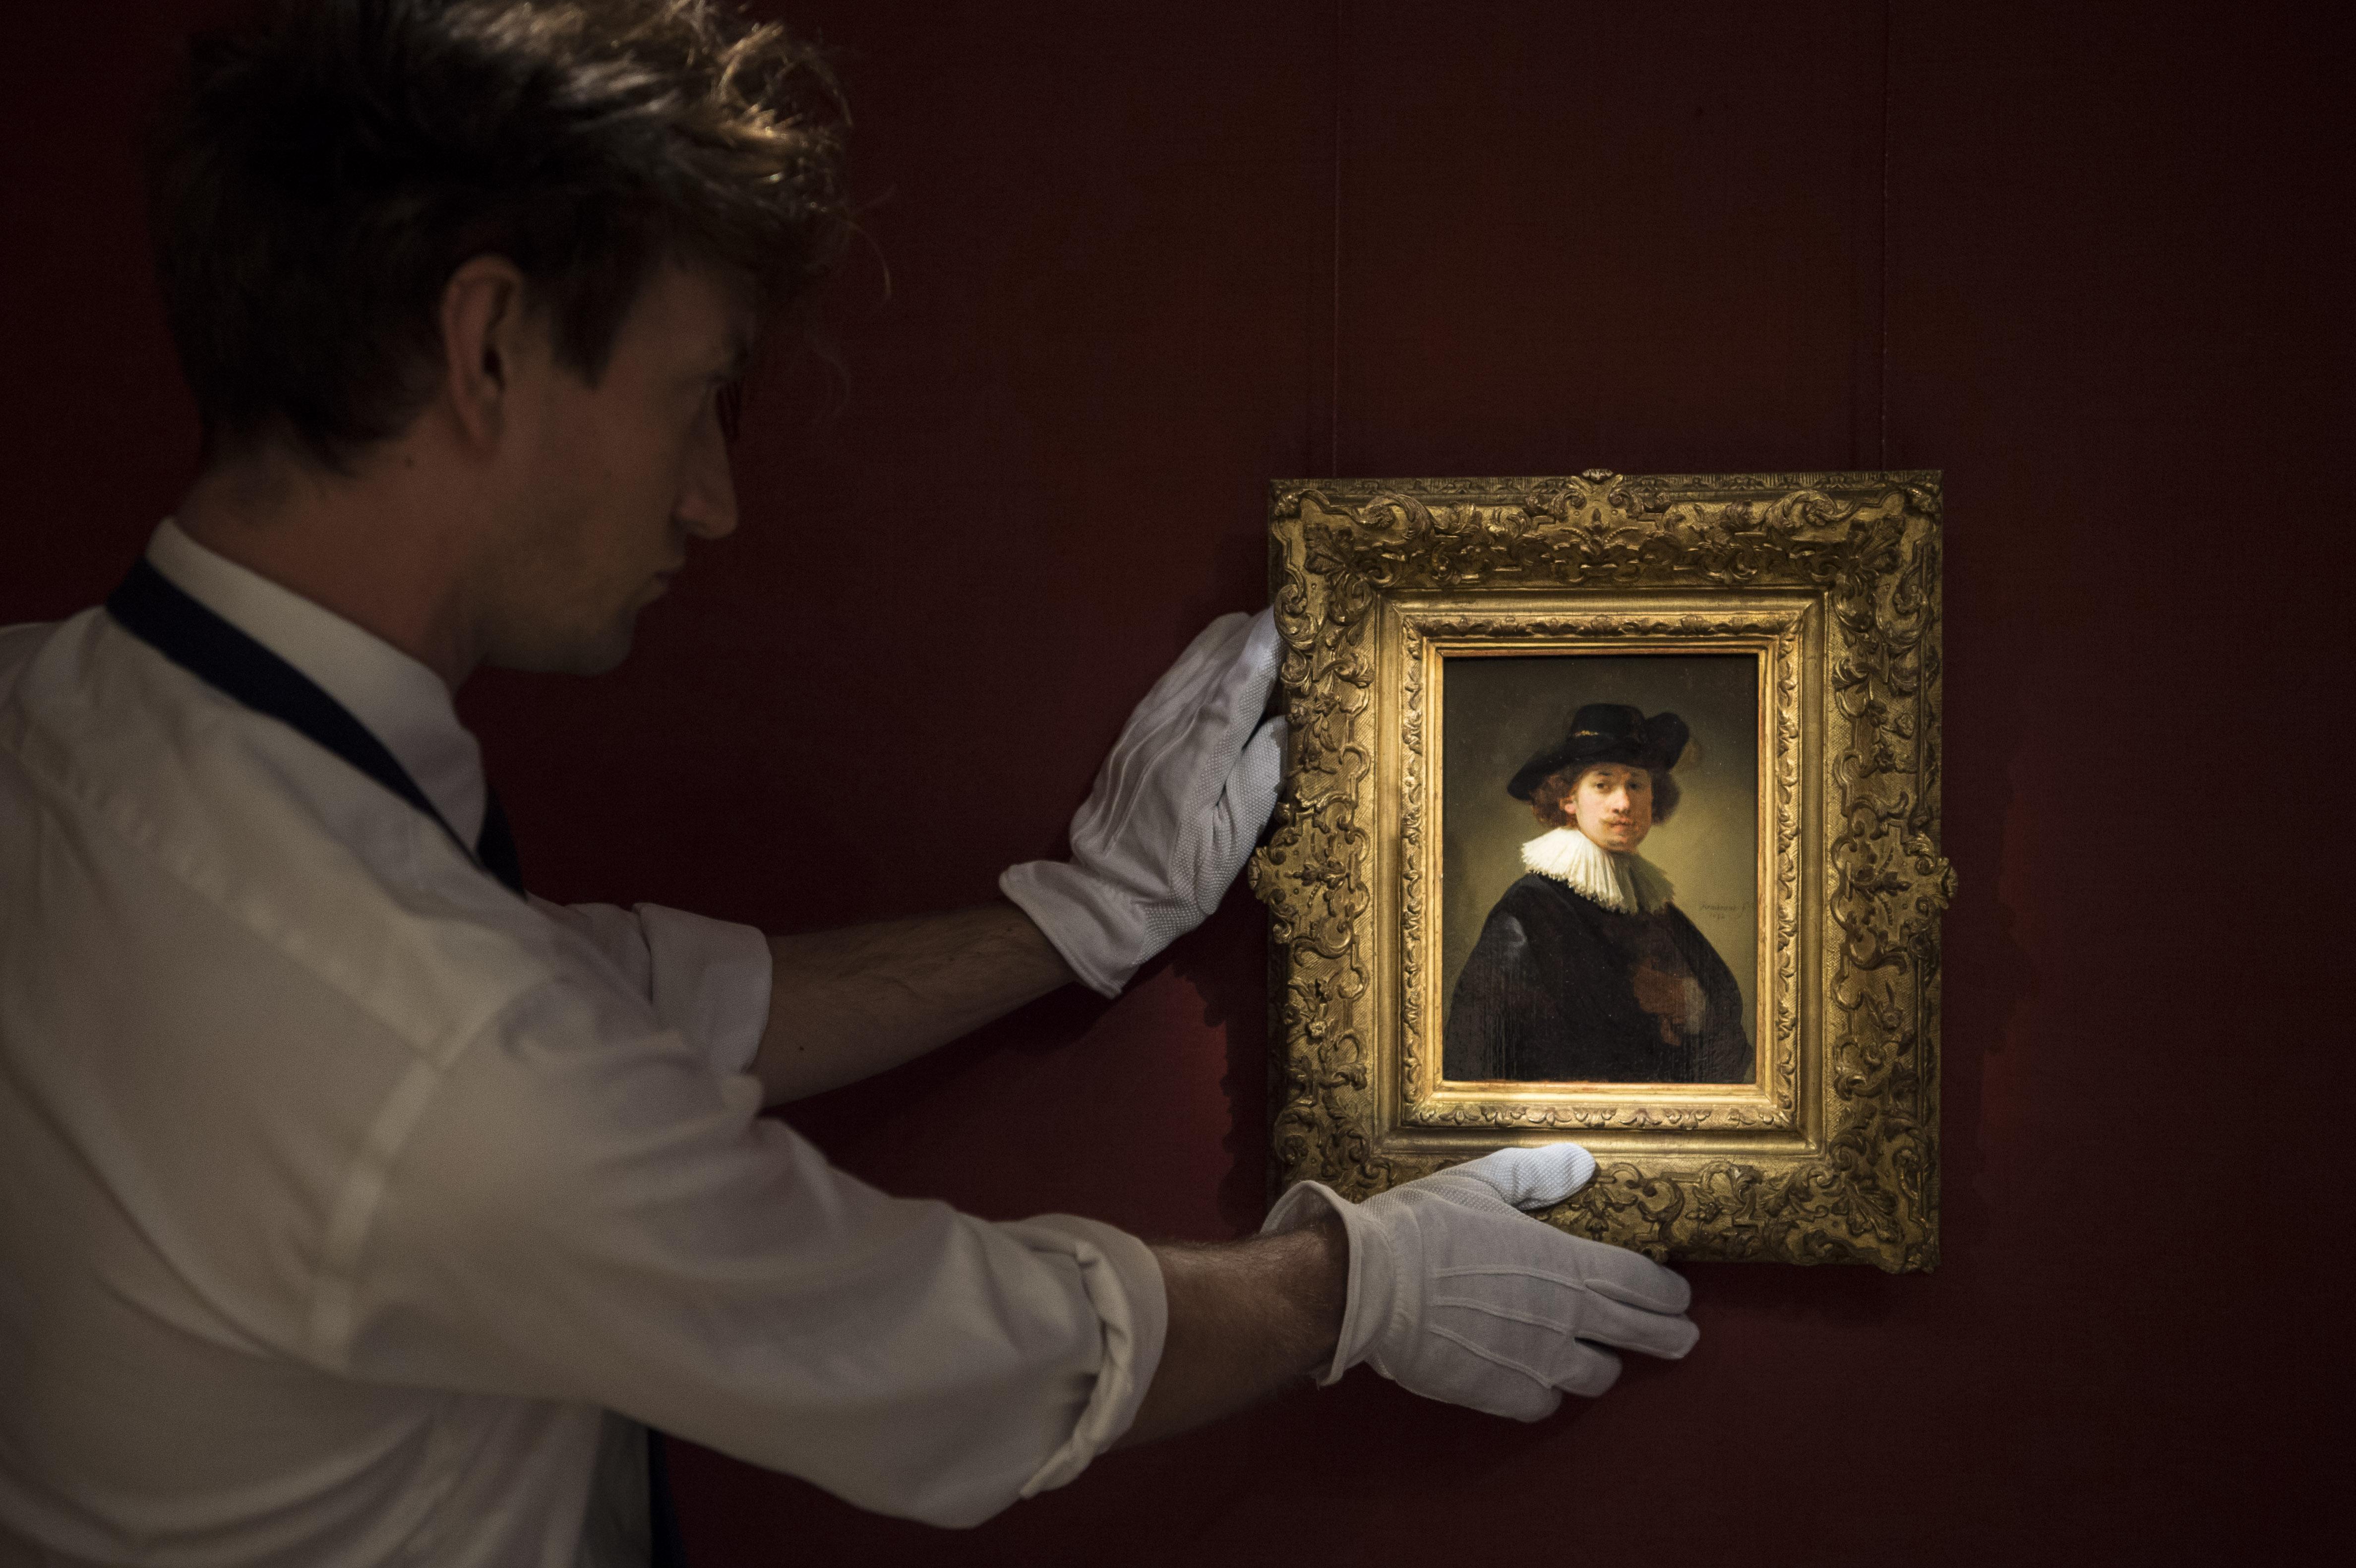 Rembrandt Van Rijn, Self-portrait, wearing a ruff and black hat, 1632, est £12-16 million ($15-20 million) -Photographer Antony Jones (2)